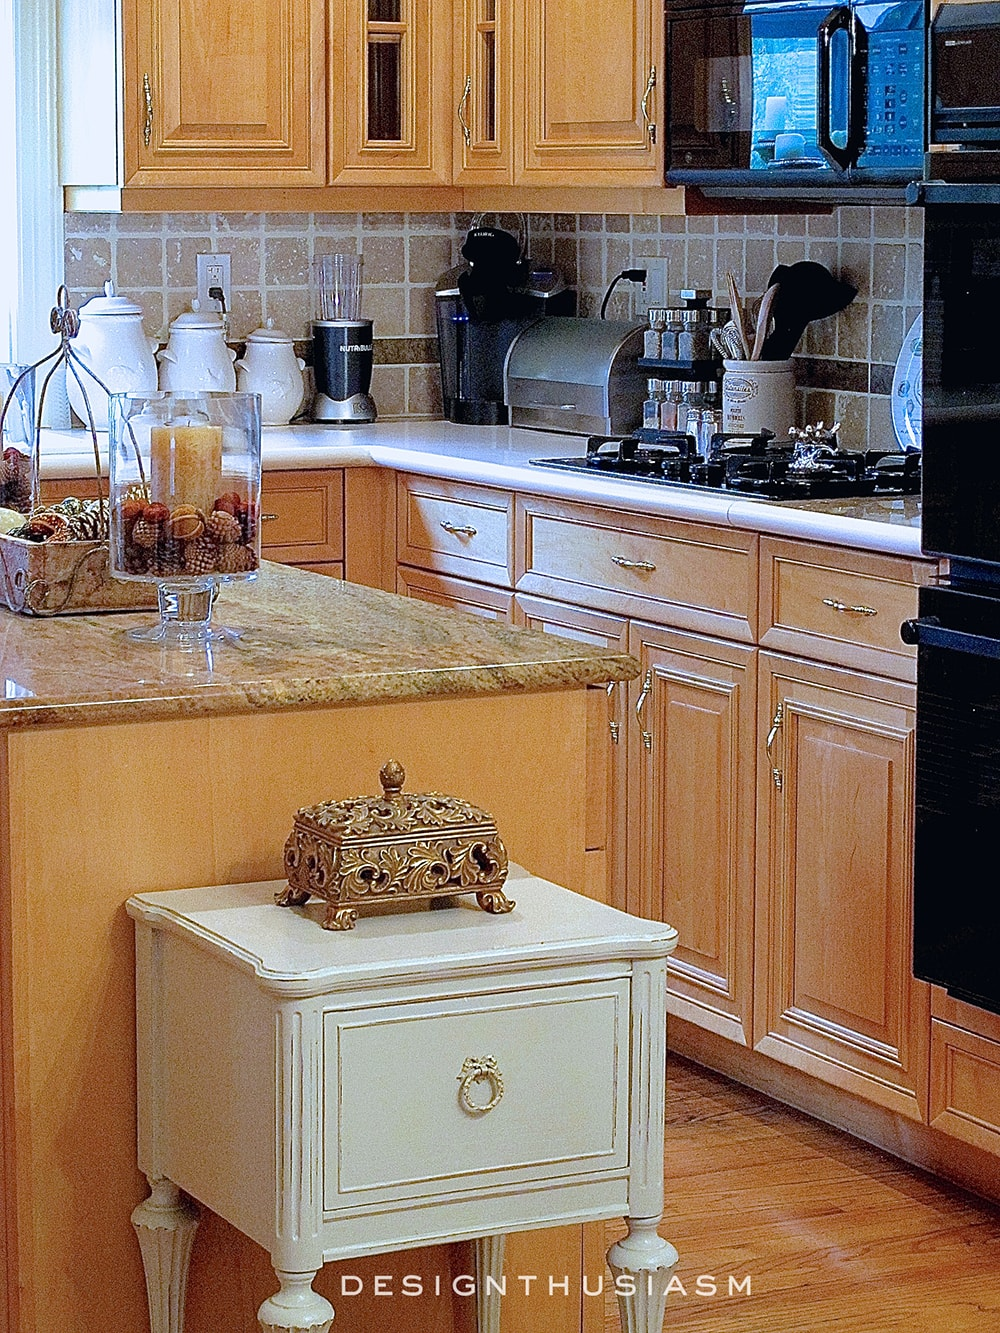 Kitchen   Family House Tour   Designthusiasm.com